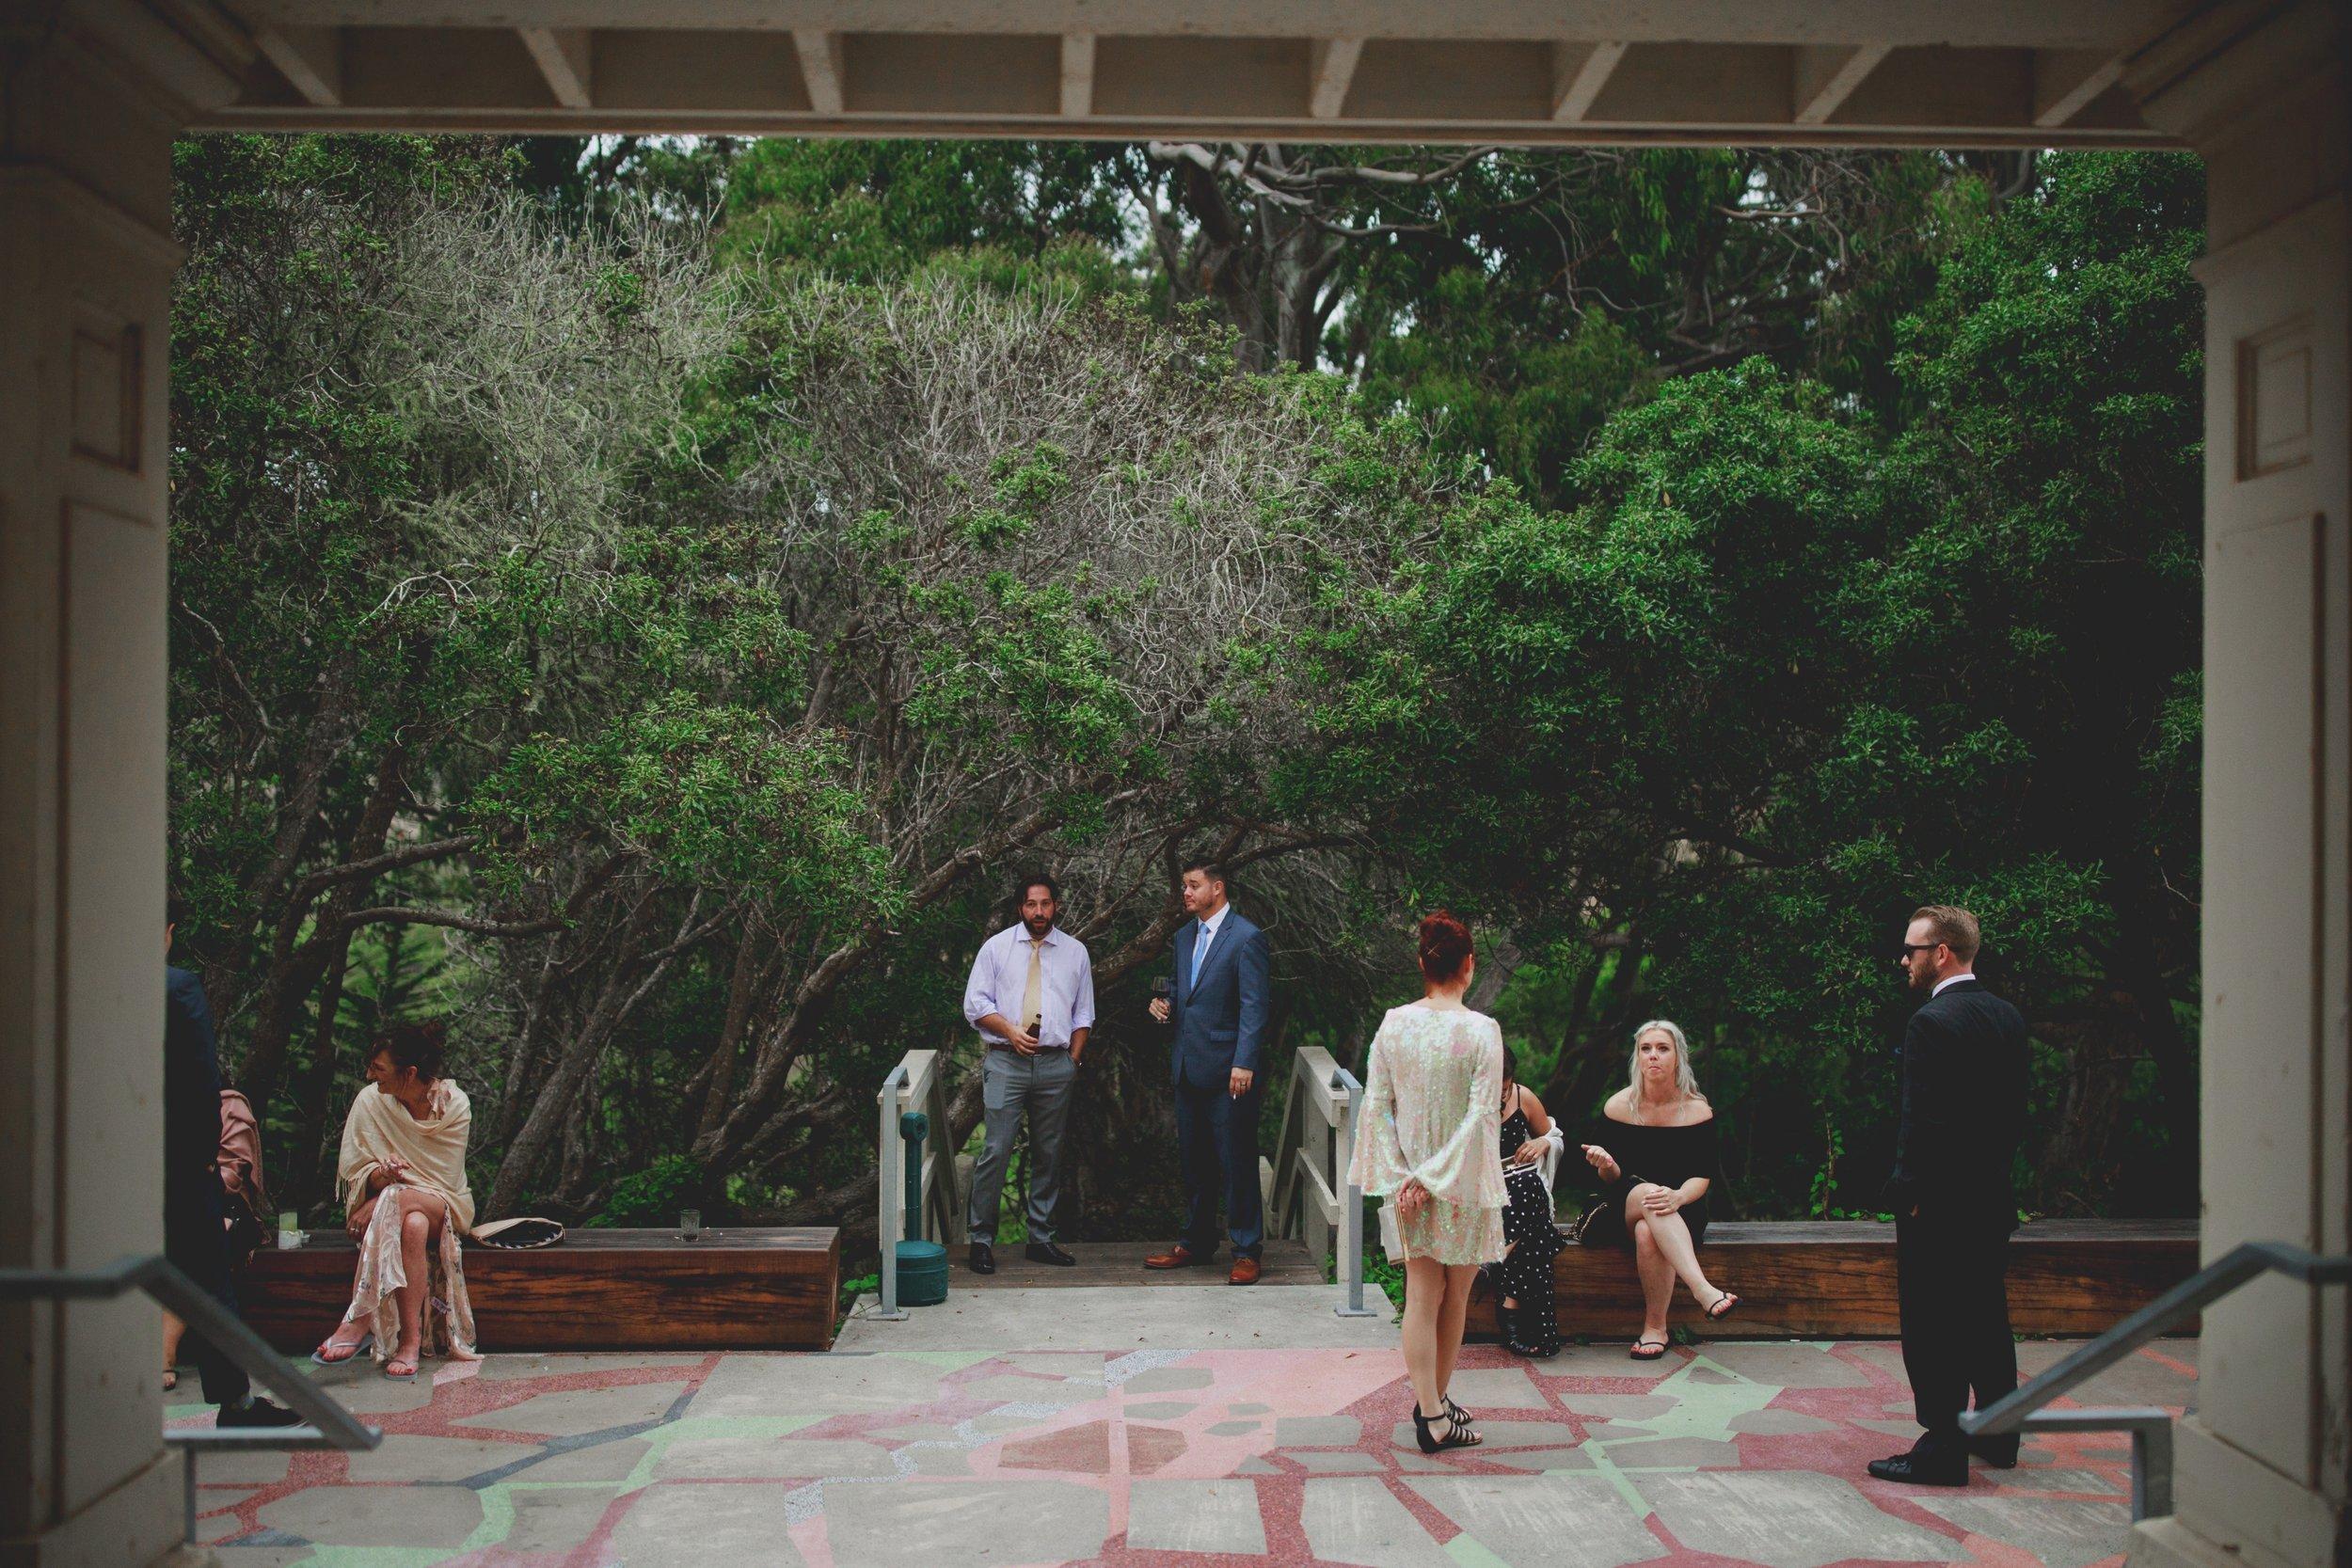 amandavanvels_headlands_center_wedding_san_francisco_172.jpg